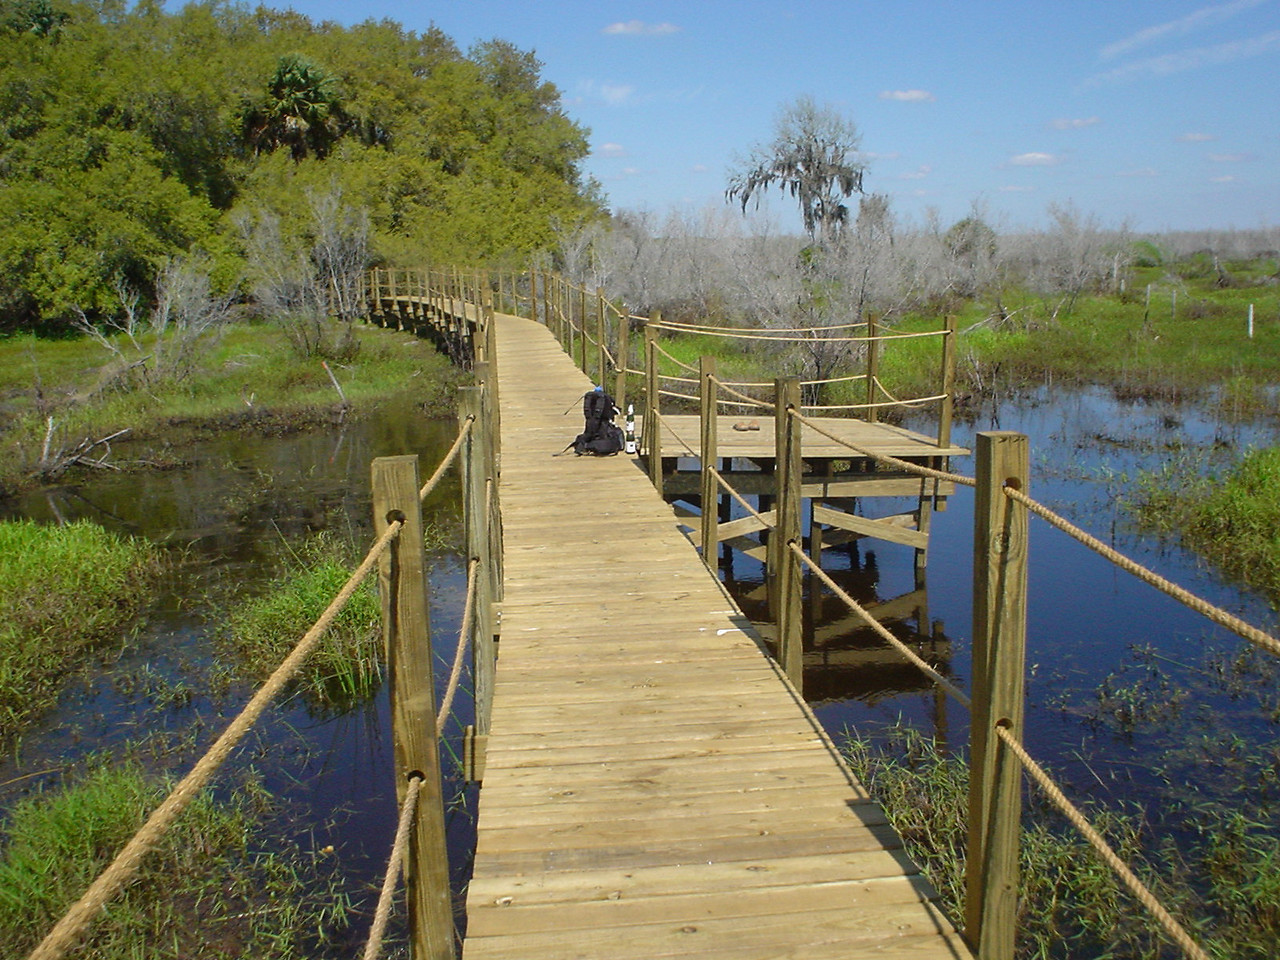 Bluff Hammock Boardwalk on the Kissimee River<br /> location: Bluff Hammock<br /> photo credit: Bob Woods / Florida Trail Association